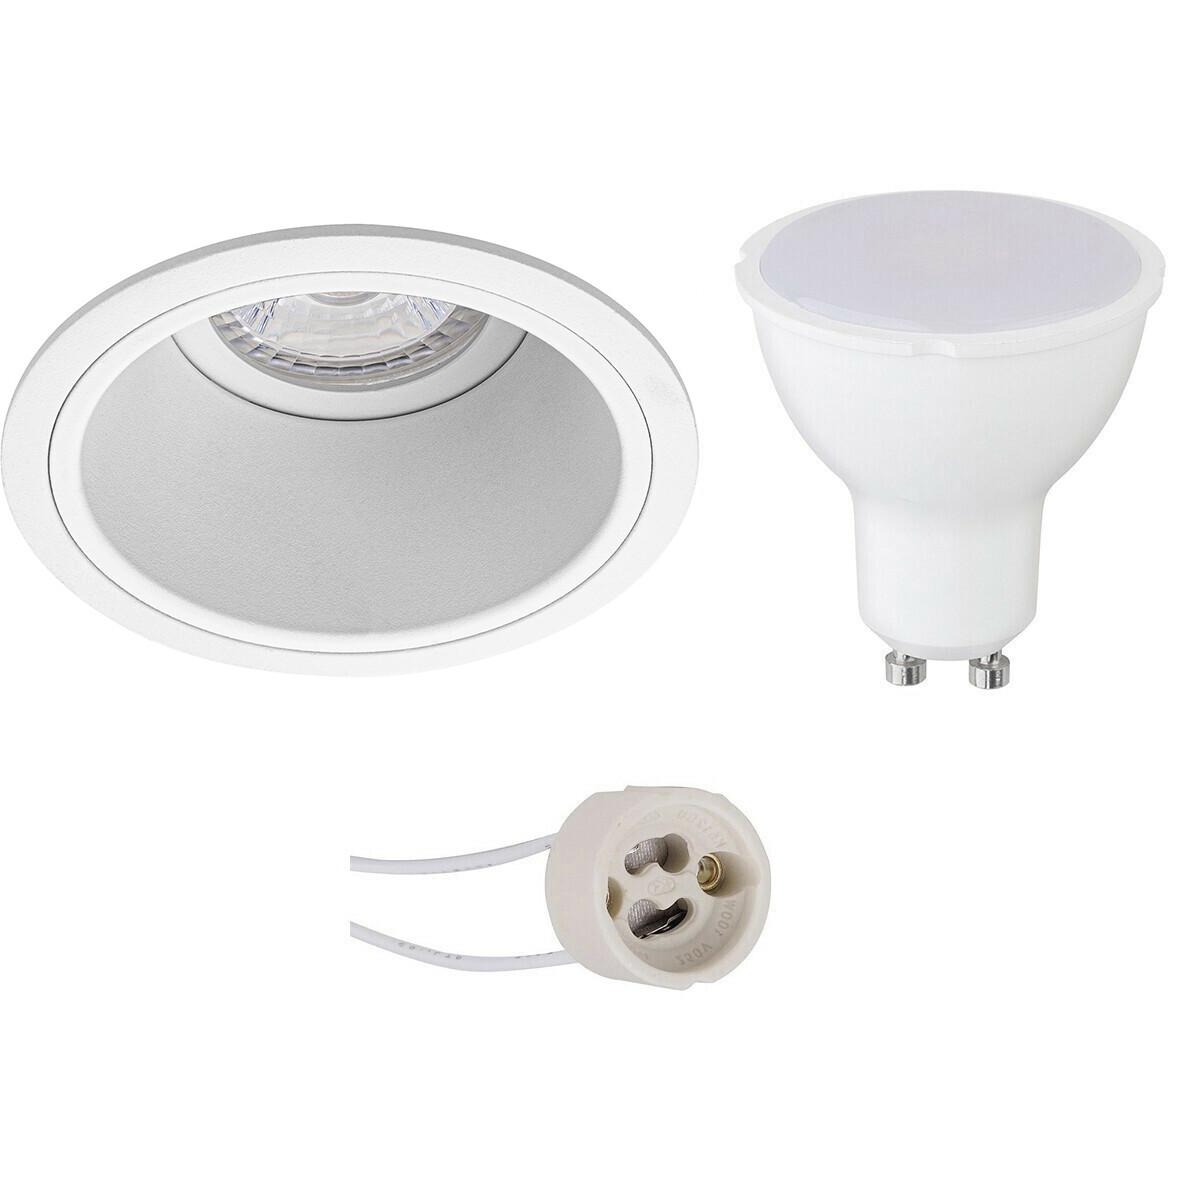 LED Spot Set - Pragmi Minko Pro - GU10 Fitting - Inbouw Rond - Mat Wit - 8W - Natuurlijk Wit 4200K -